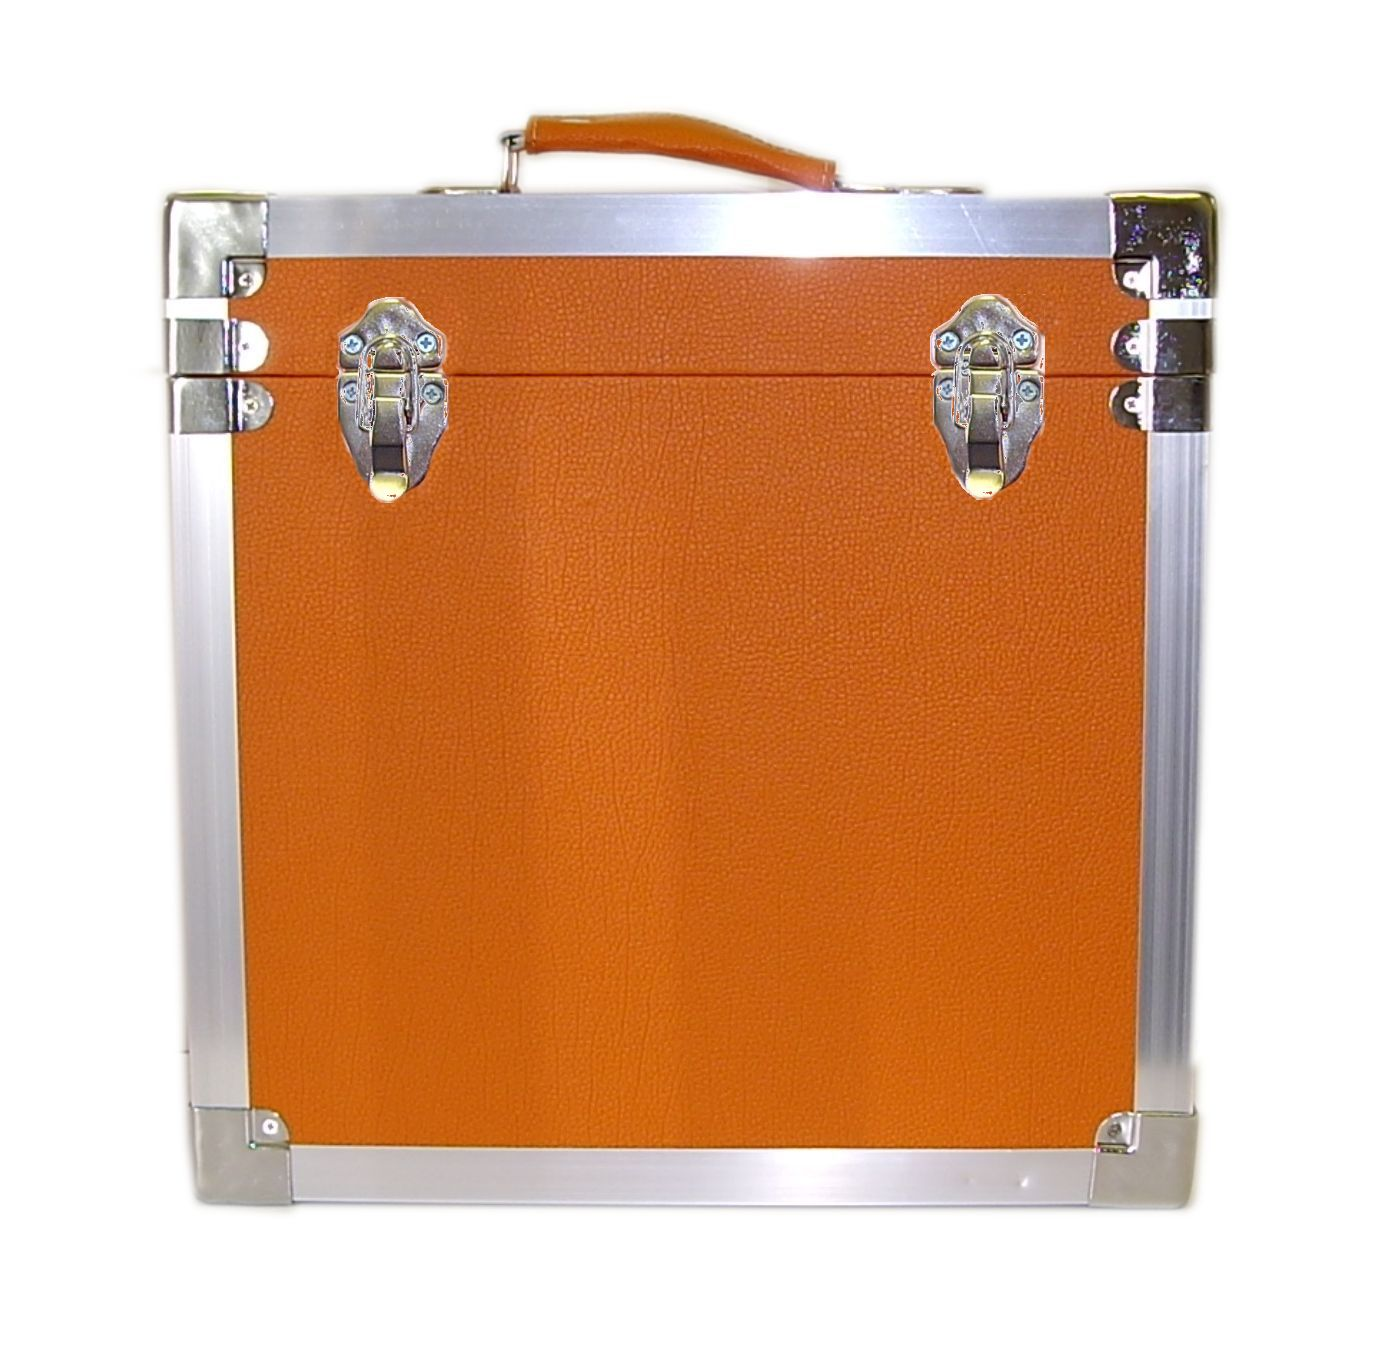 Steepletone SRB 2 12 Inch LP Vinyl Retro Style Record Storage Carry Case (Orange)